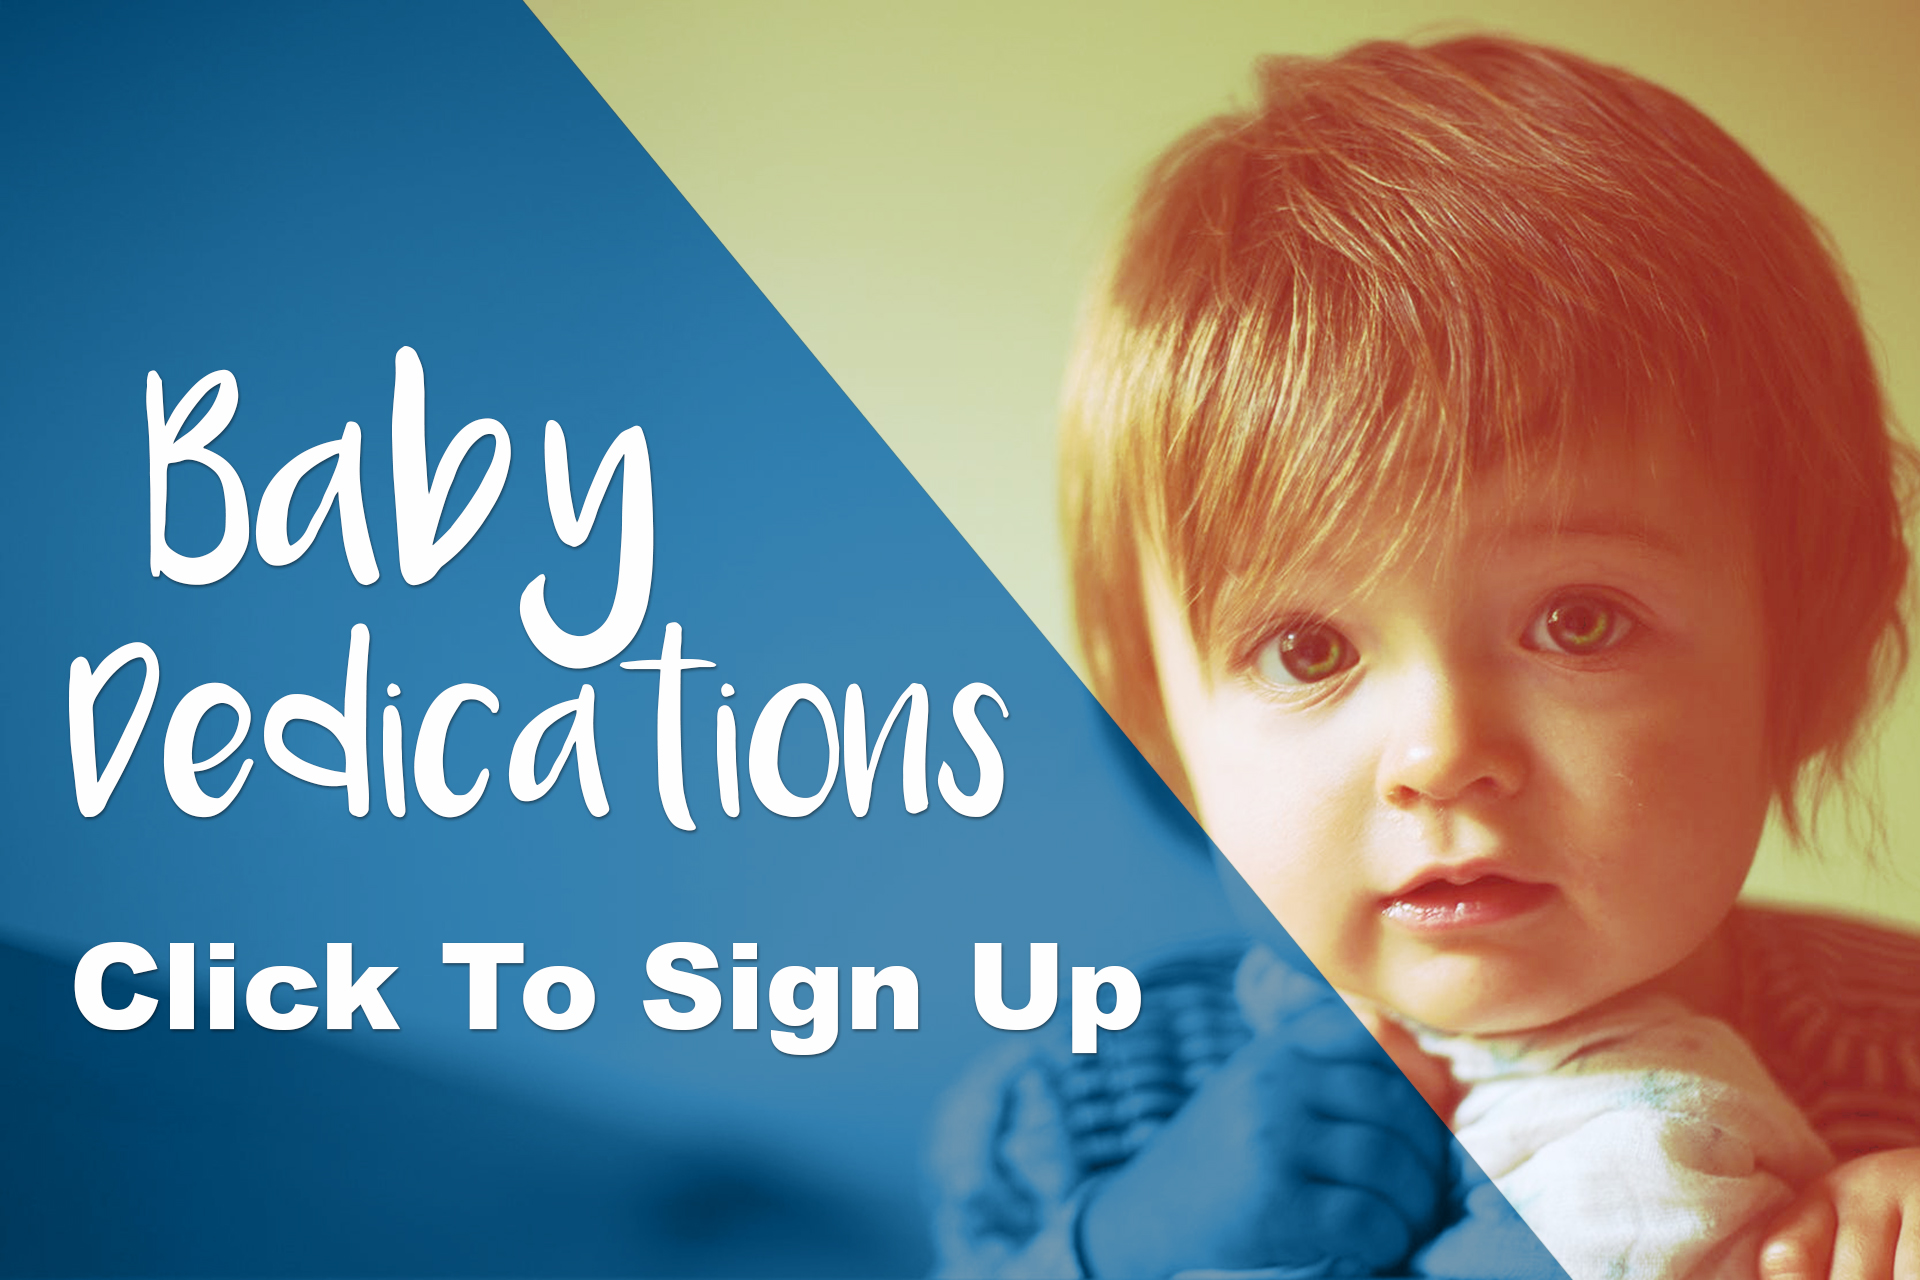 vfc_babydedications_websitegraphic.jpg